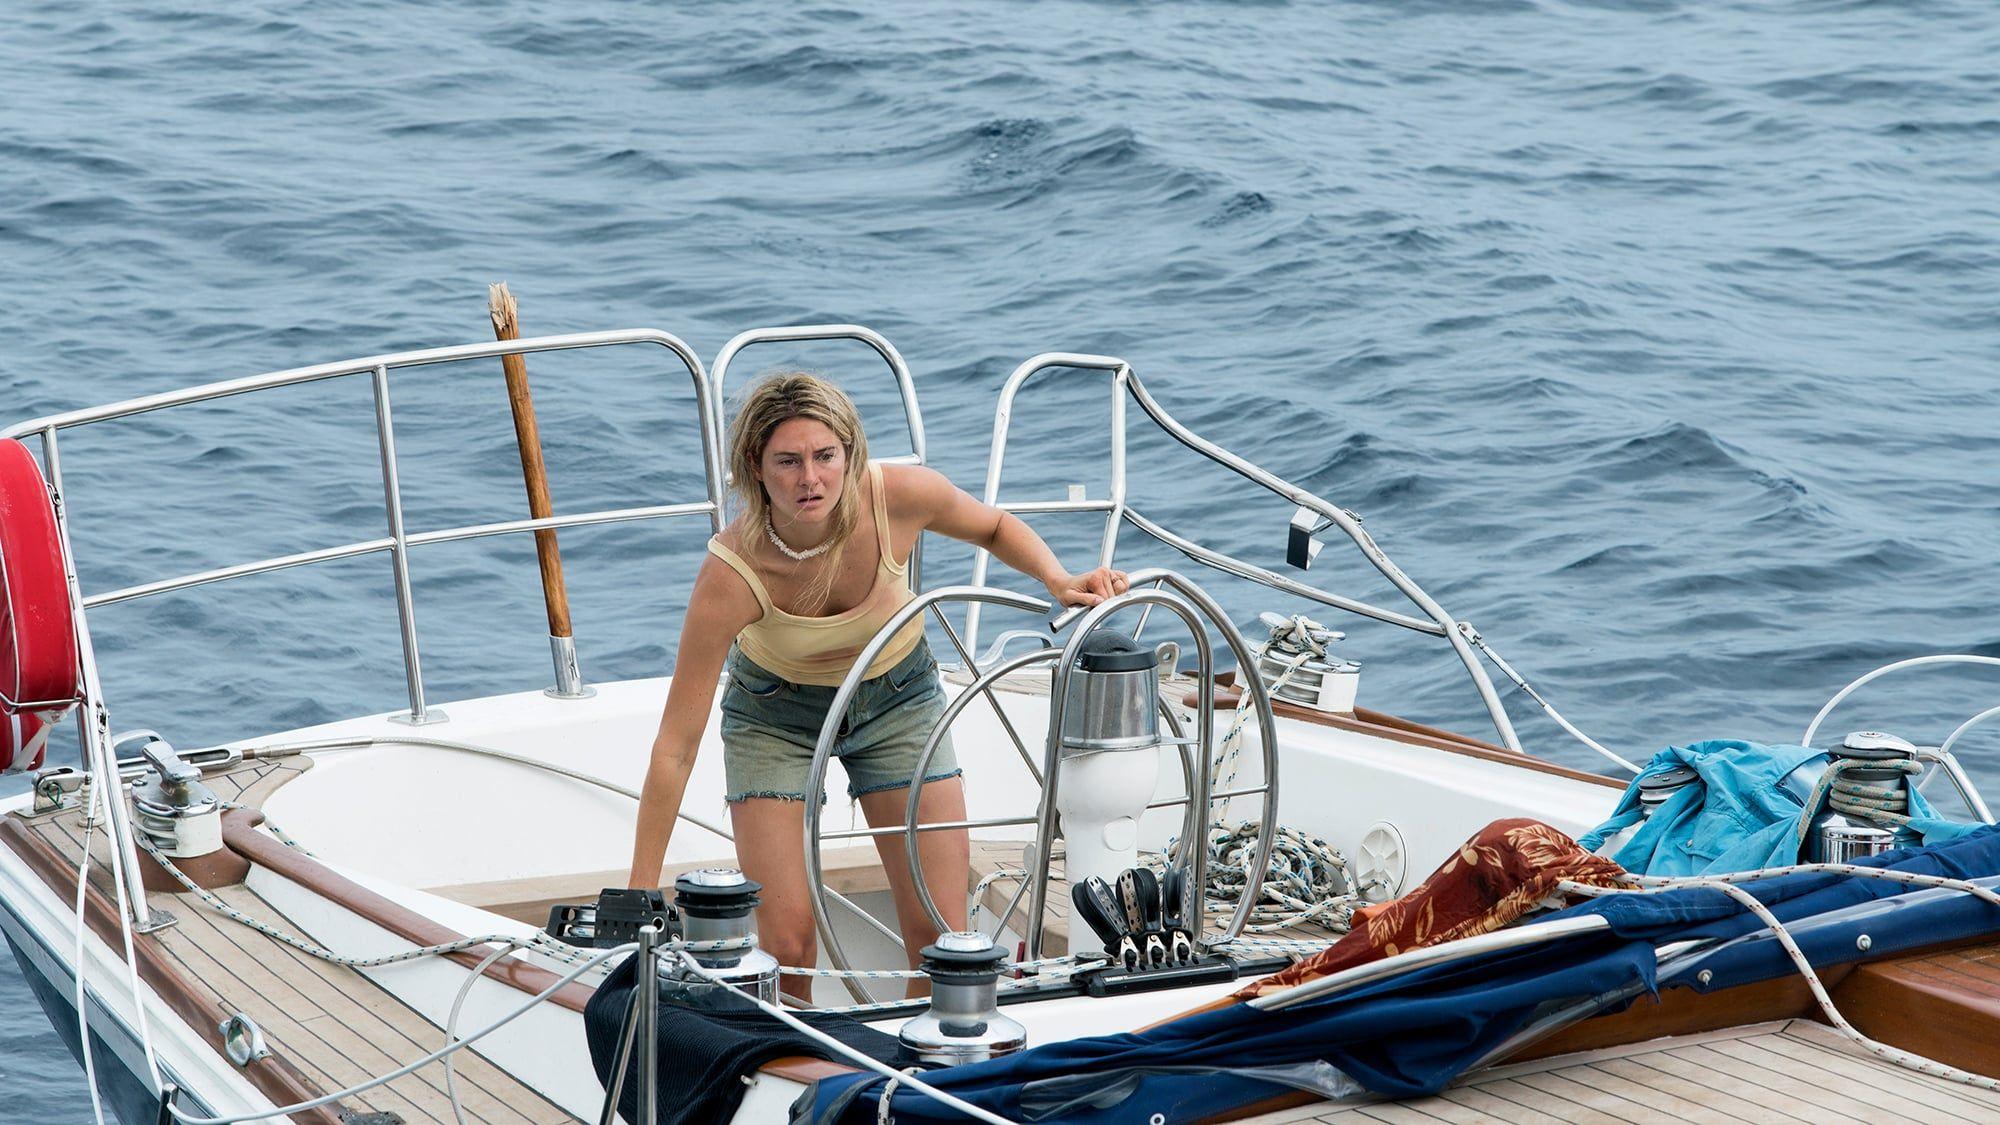 Watch Adrift Full Movie Hd 1080p Films Complets Film En Ligne Film Complet En Francais